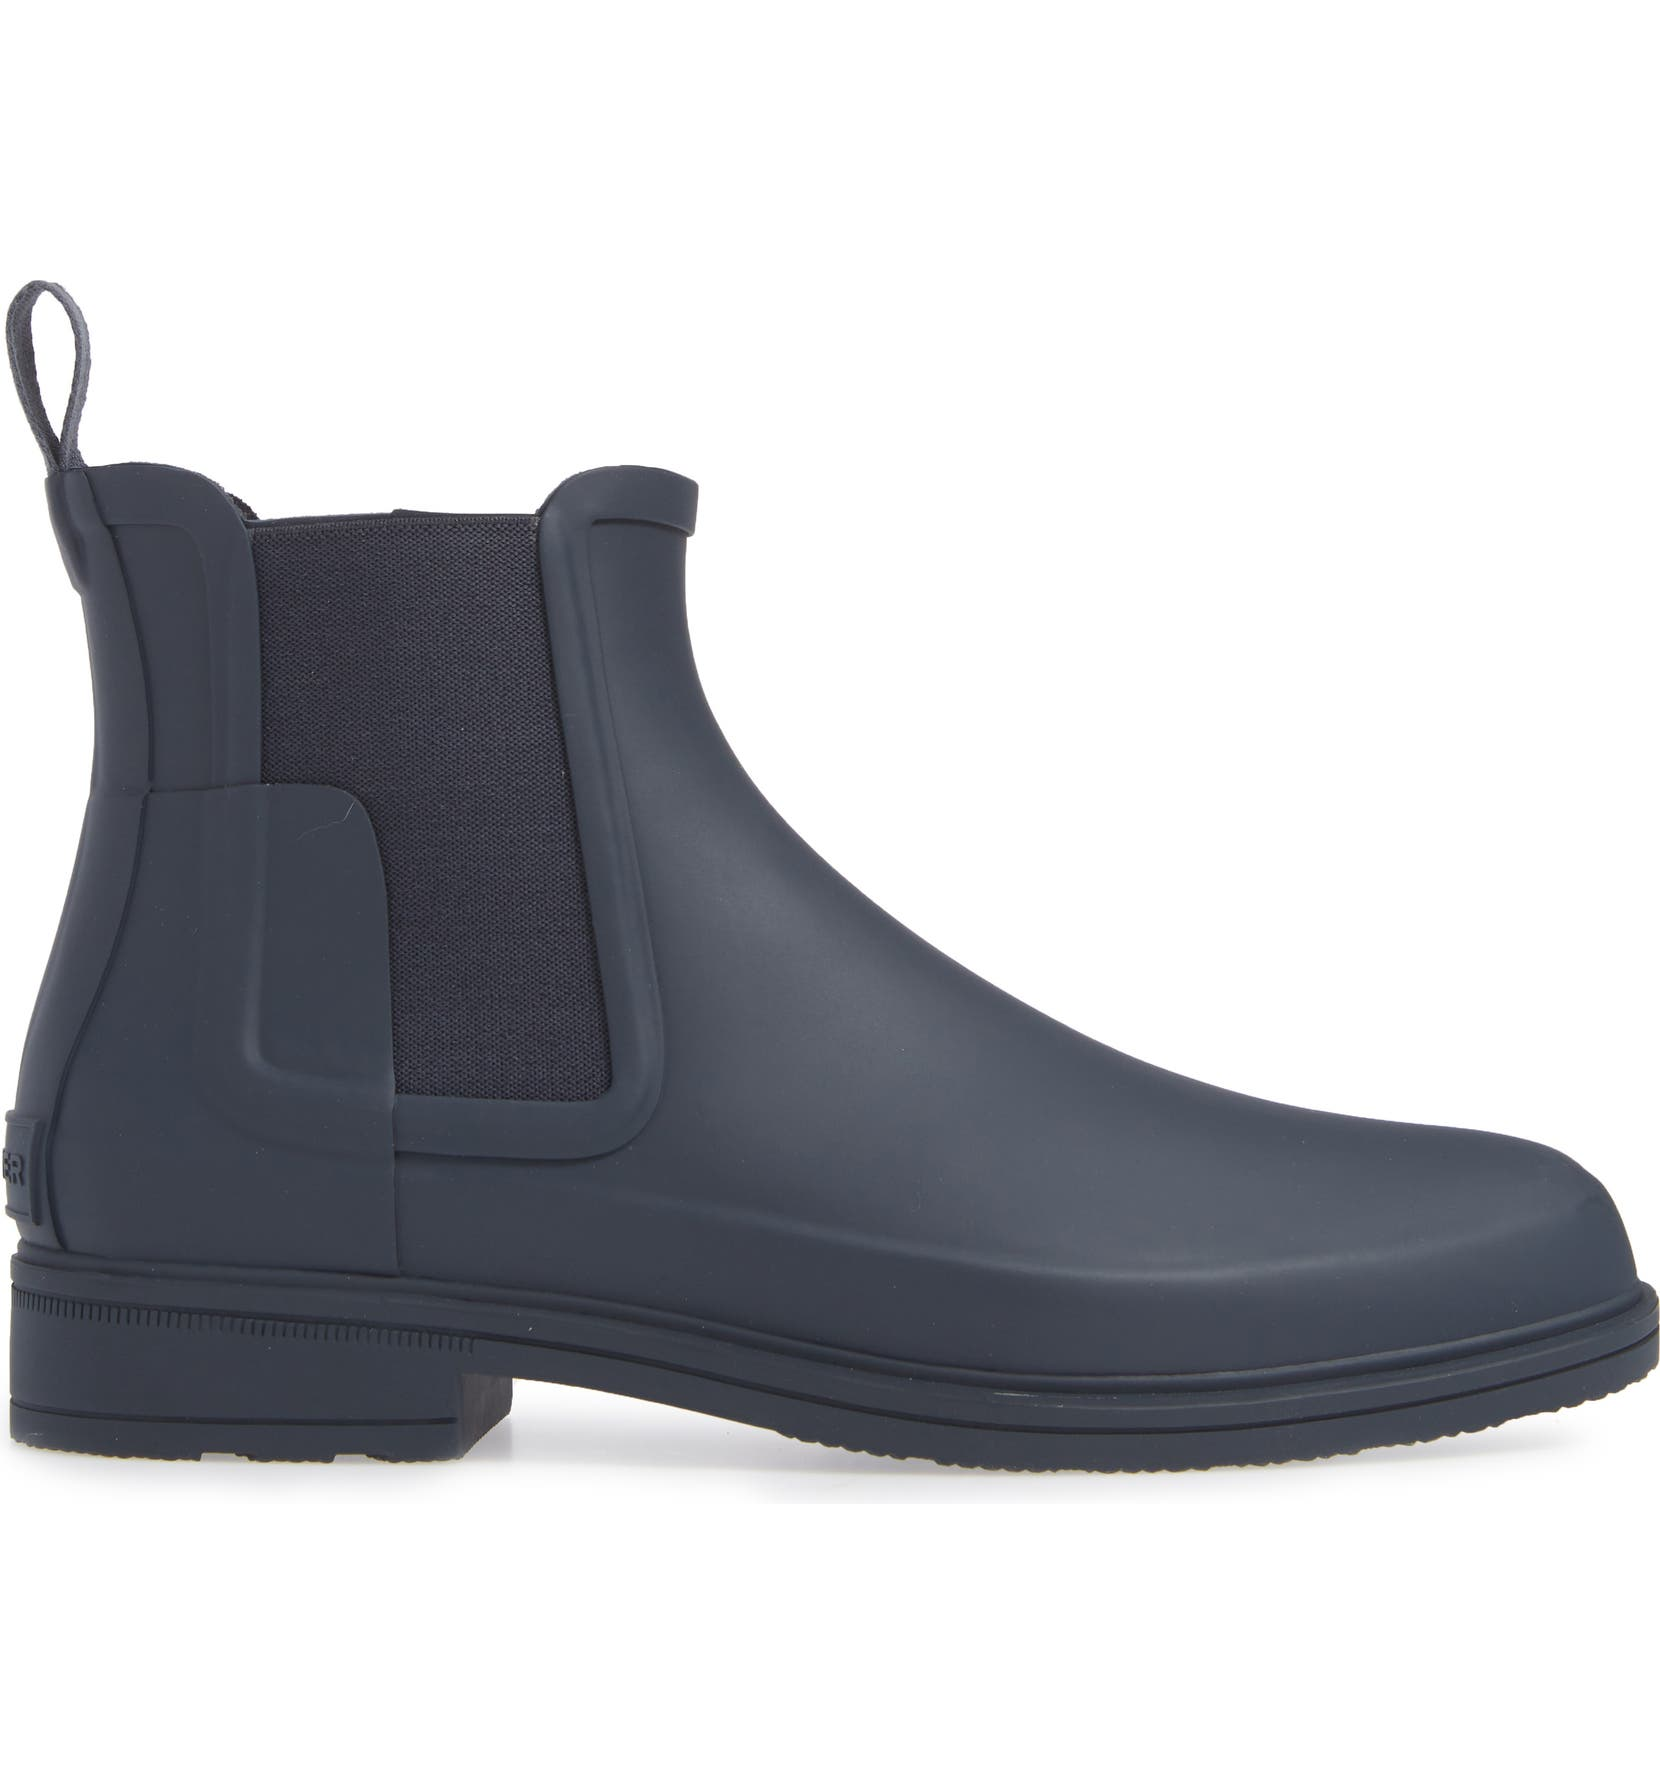 106790ad79a Original Refined Waterproof Chelsea Boot